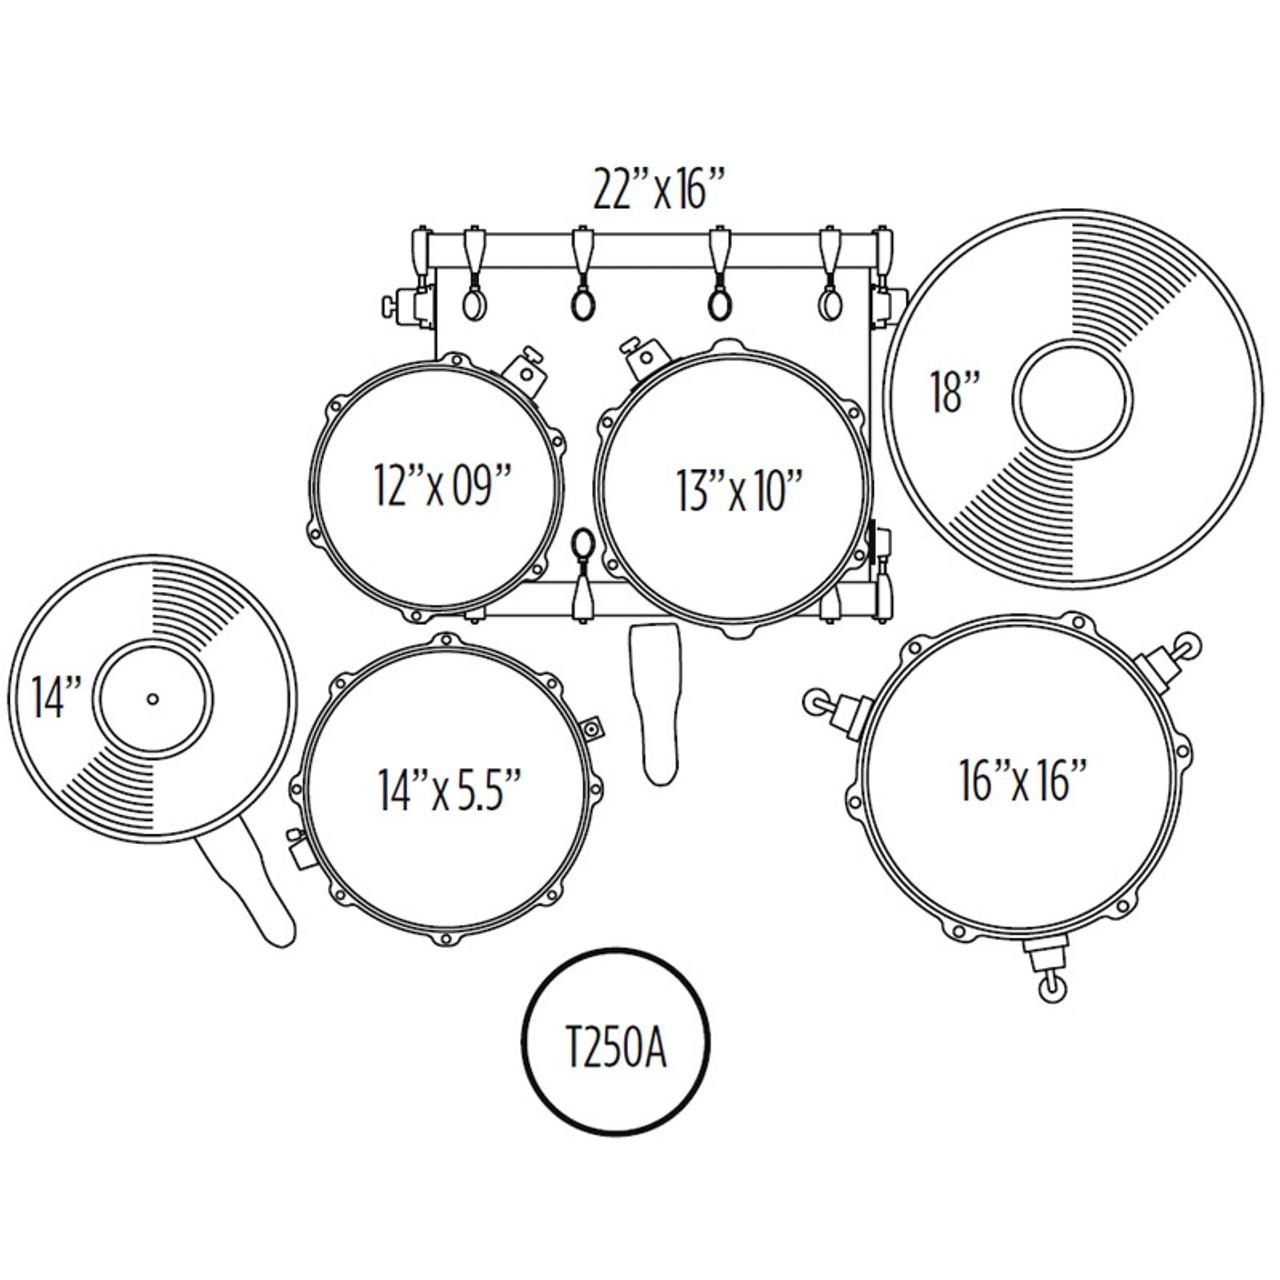 Mapex Voyager Standard Drum Set X8 Drums